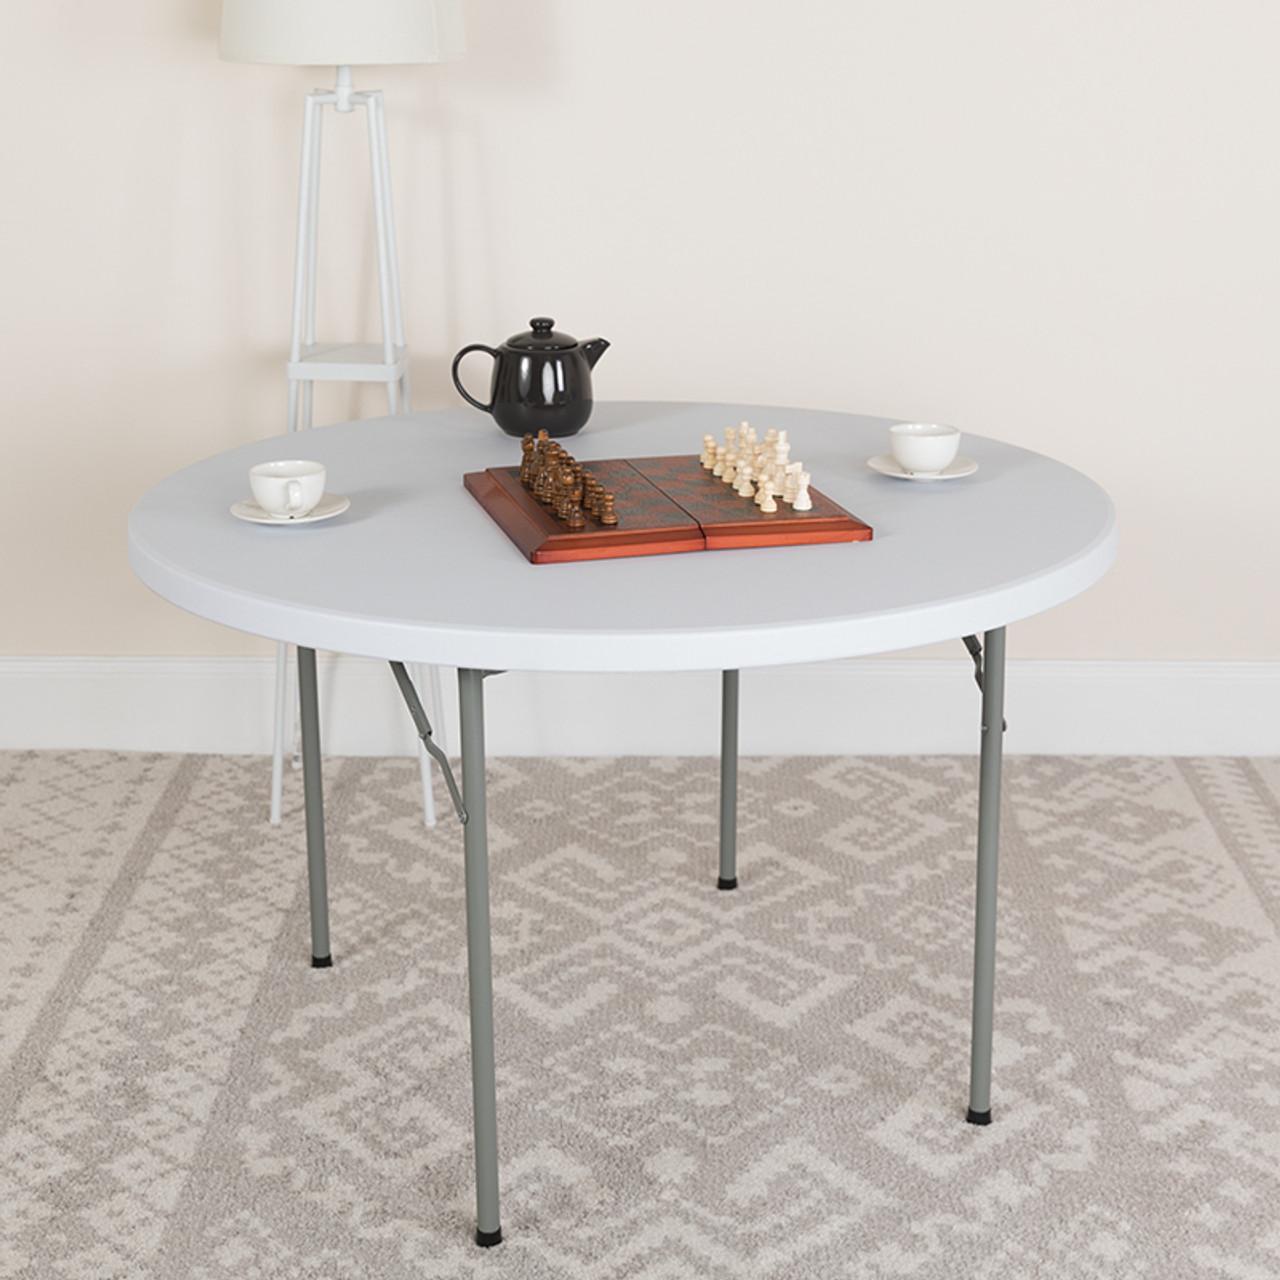 Round Plastic Folding Tables